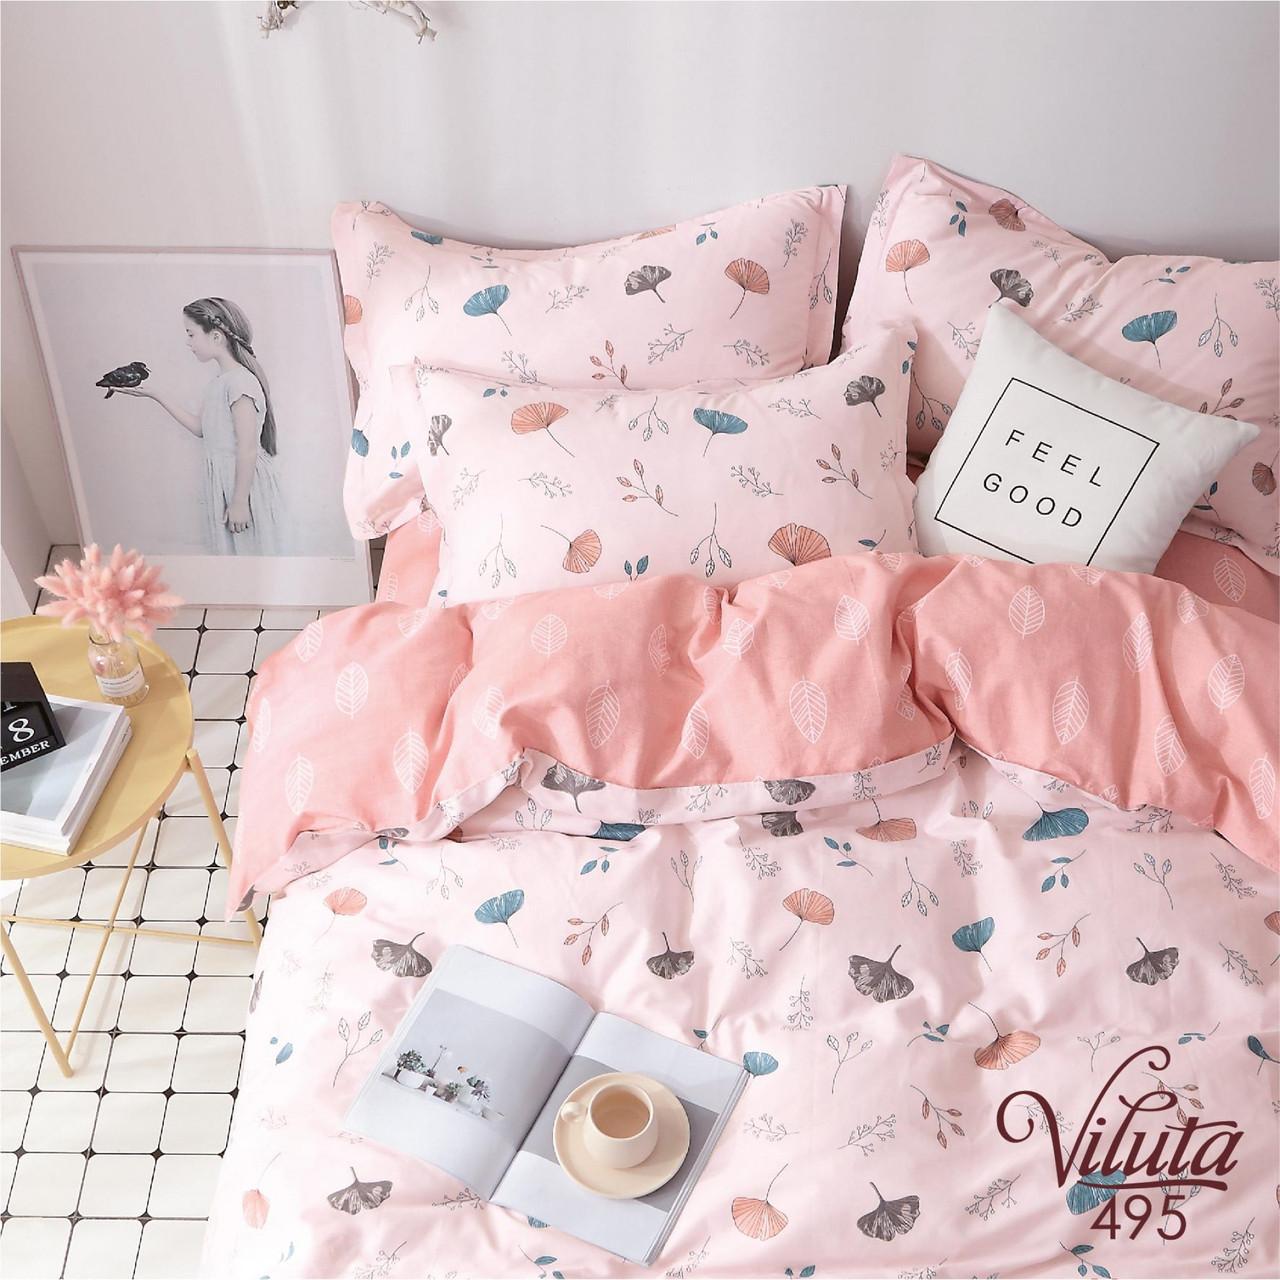 Комплект постельного белья Сатин Twill 495 ТМ Вилюта